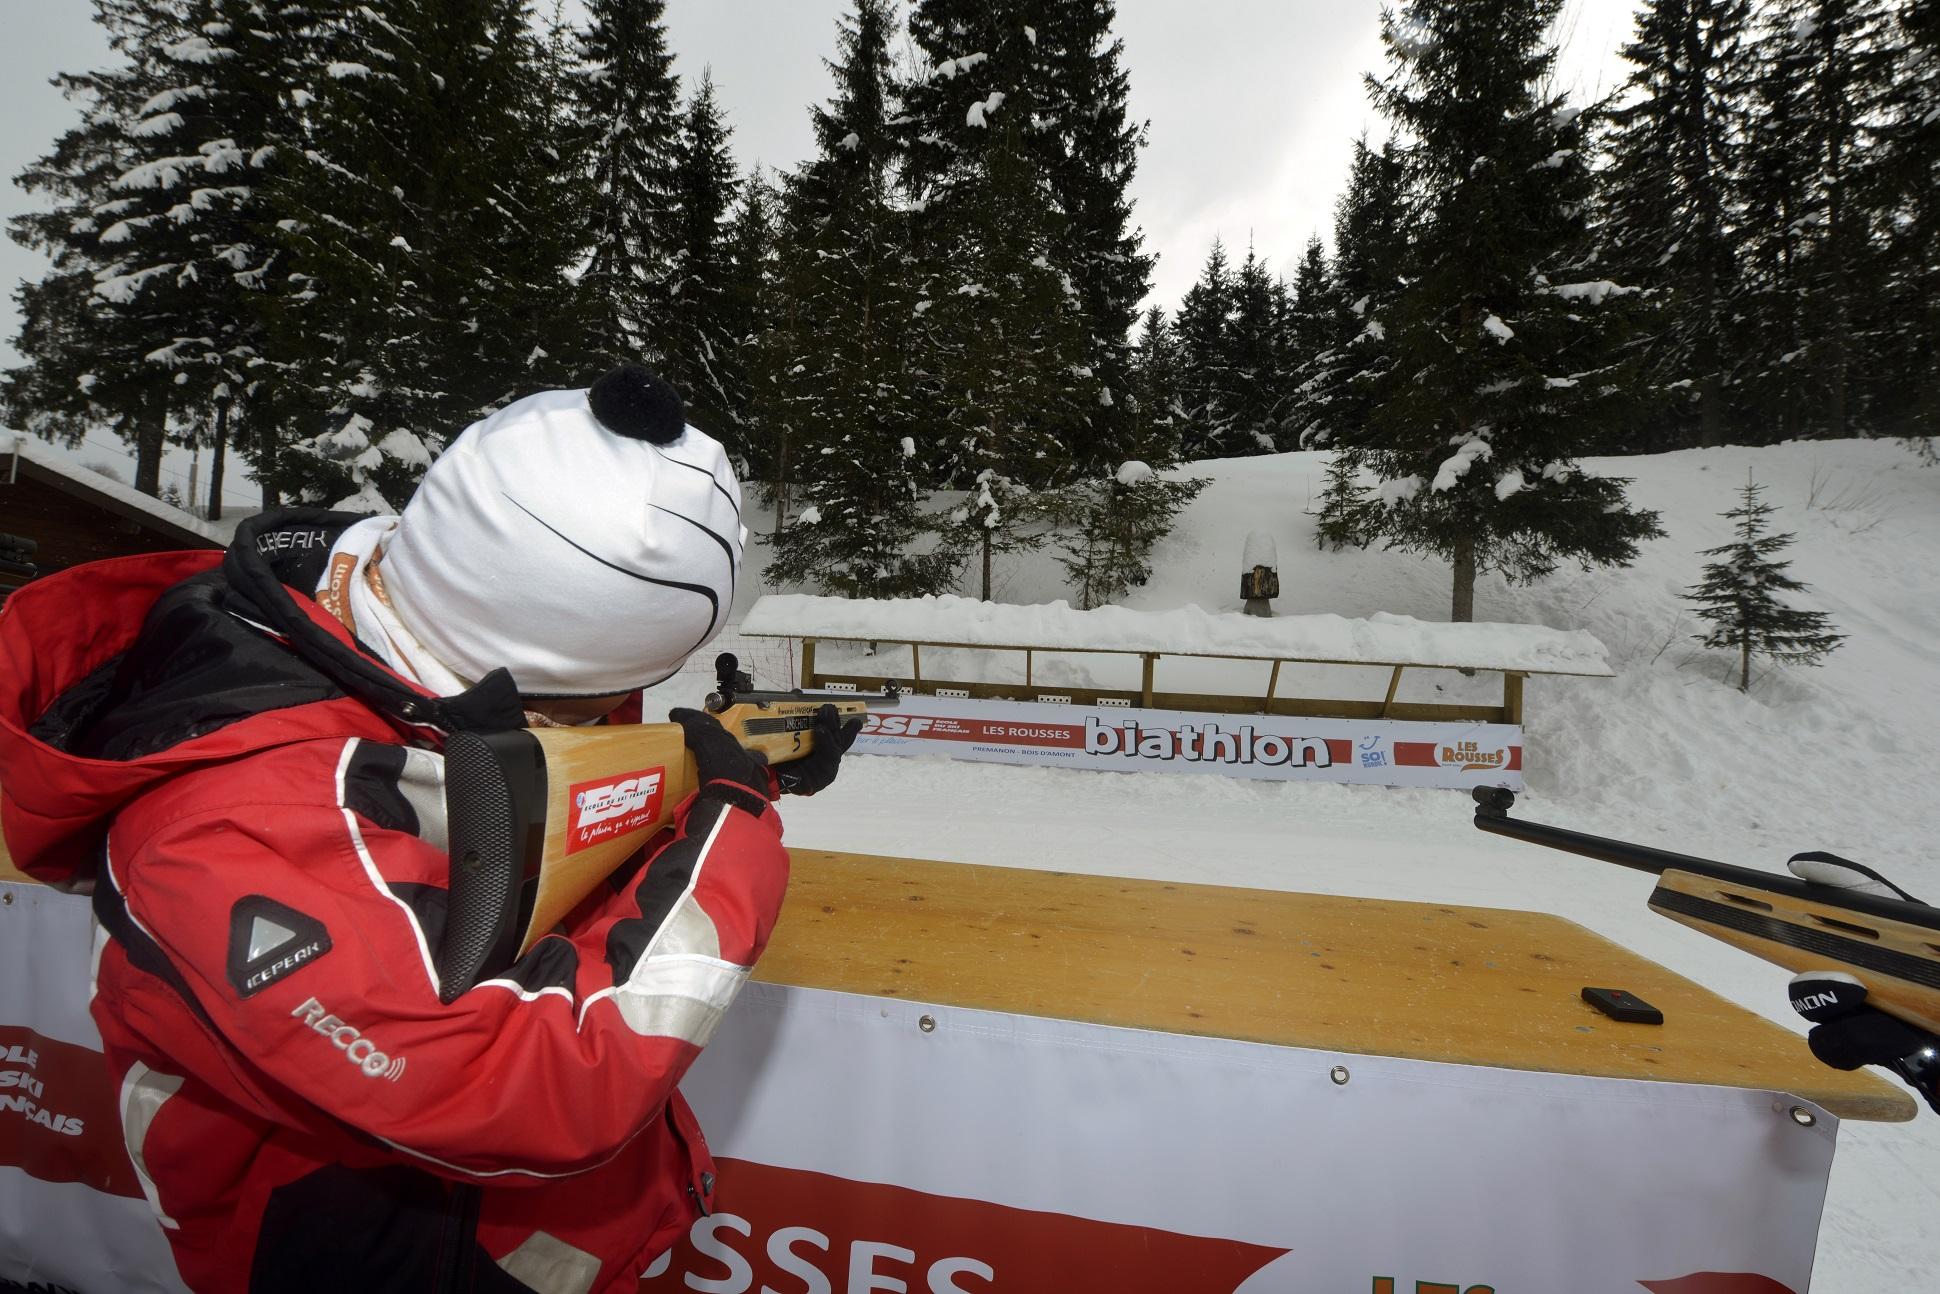 Biathlon - Station des Rousses - Hiver - Groupe - Jura - ESF